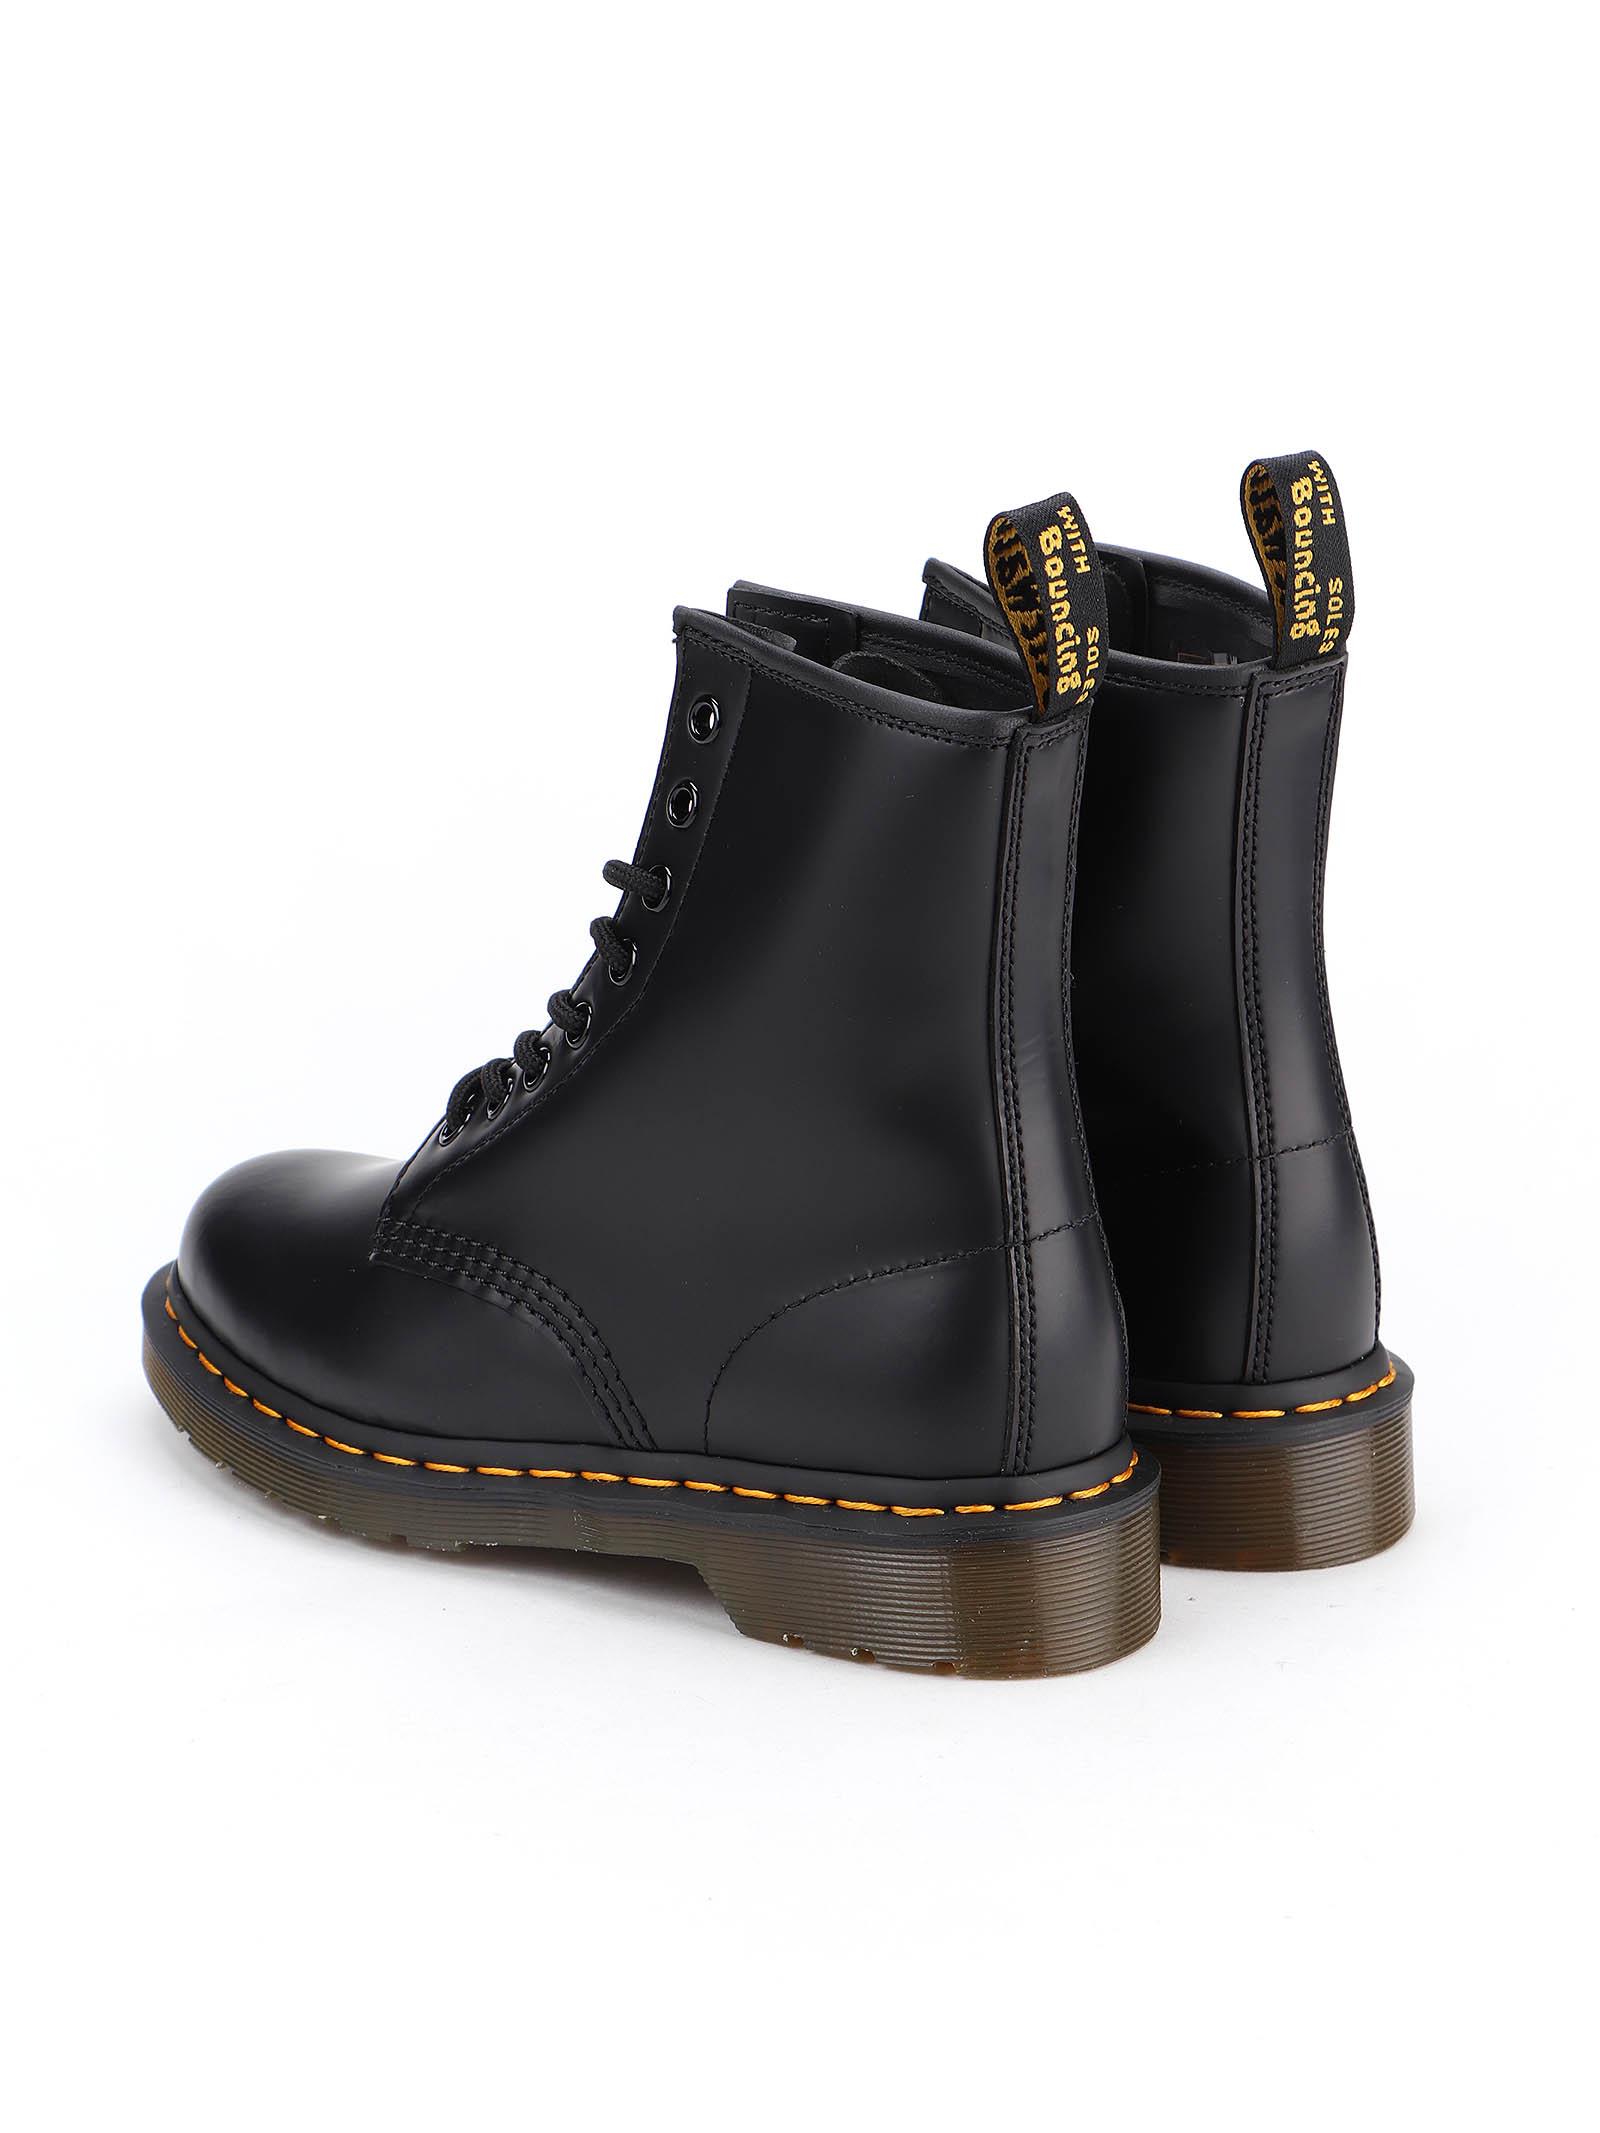 Immagine di Dr. Martens   1460 Smooth Black Boot